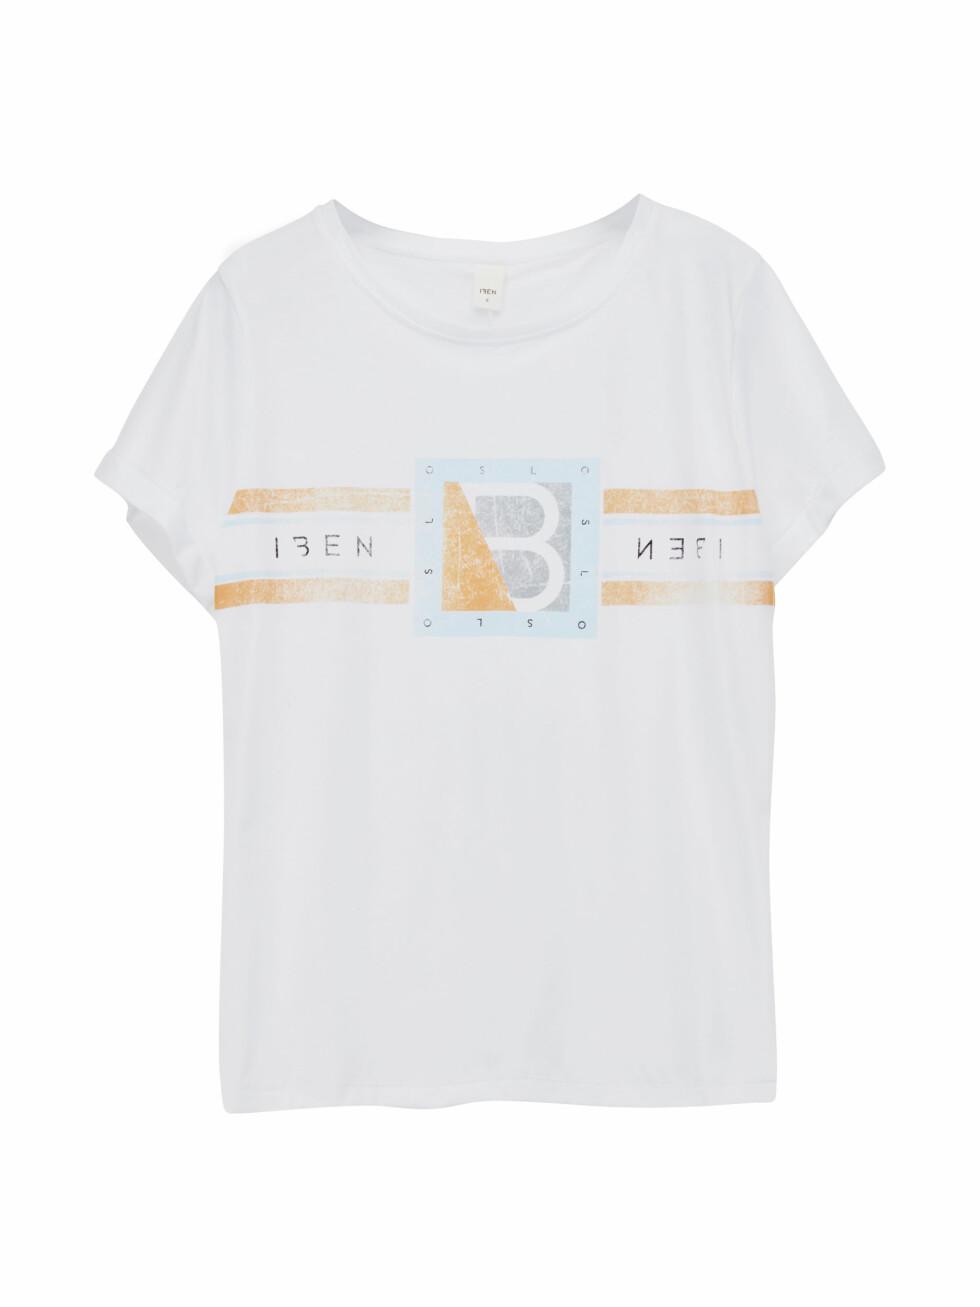 T-skjorte fra Iben |799,-| http://ibenofficial.tictail.com/product/boo-tee-logo-7332917